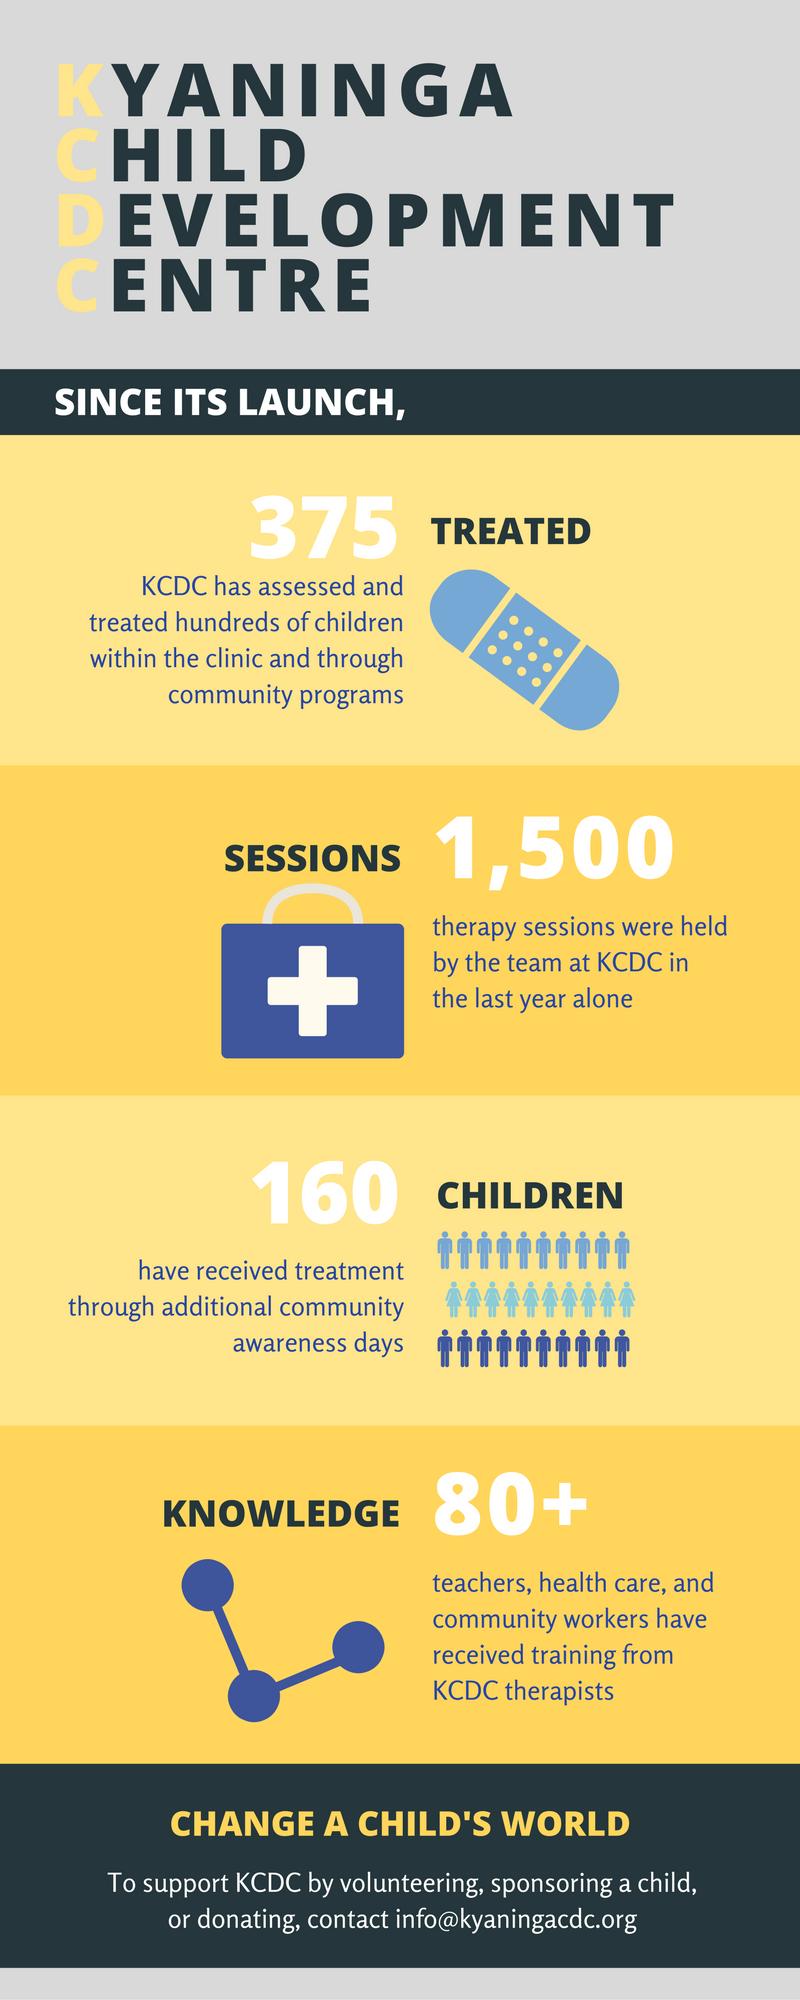 Resource: Kyaninga Child Development Centre